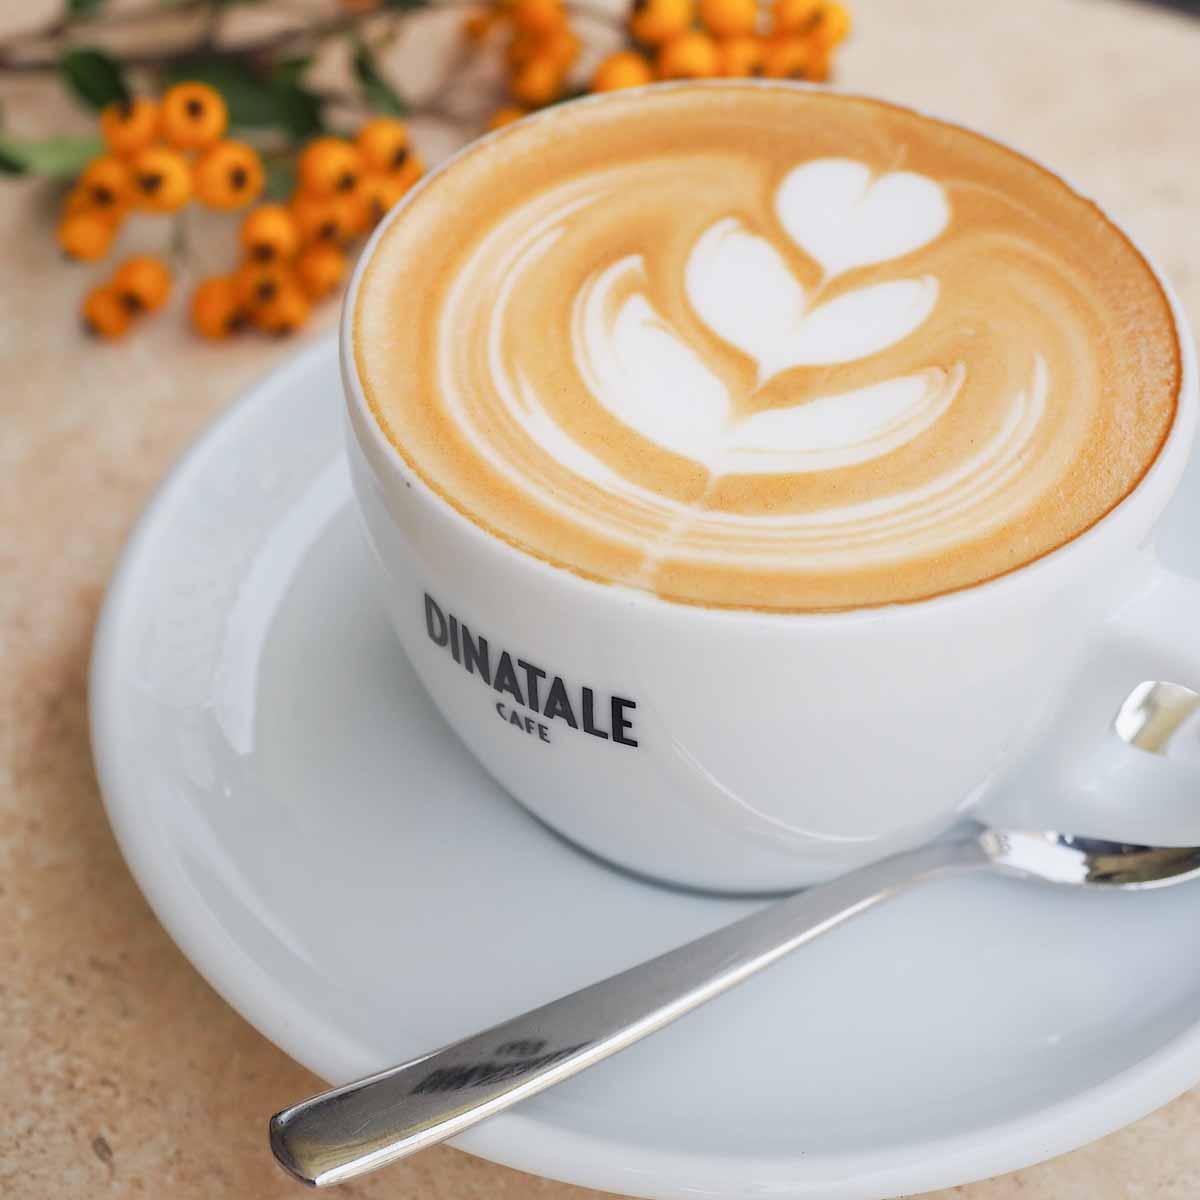 Dinatale Coffee Bar München